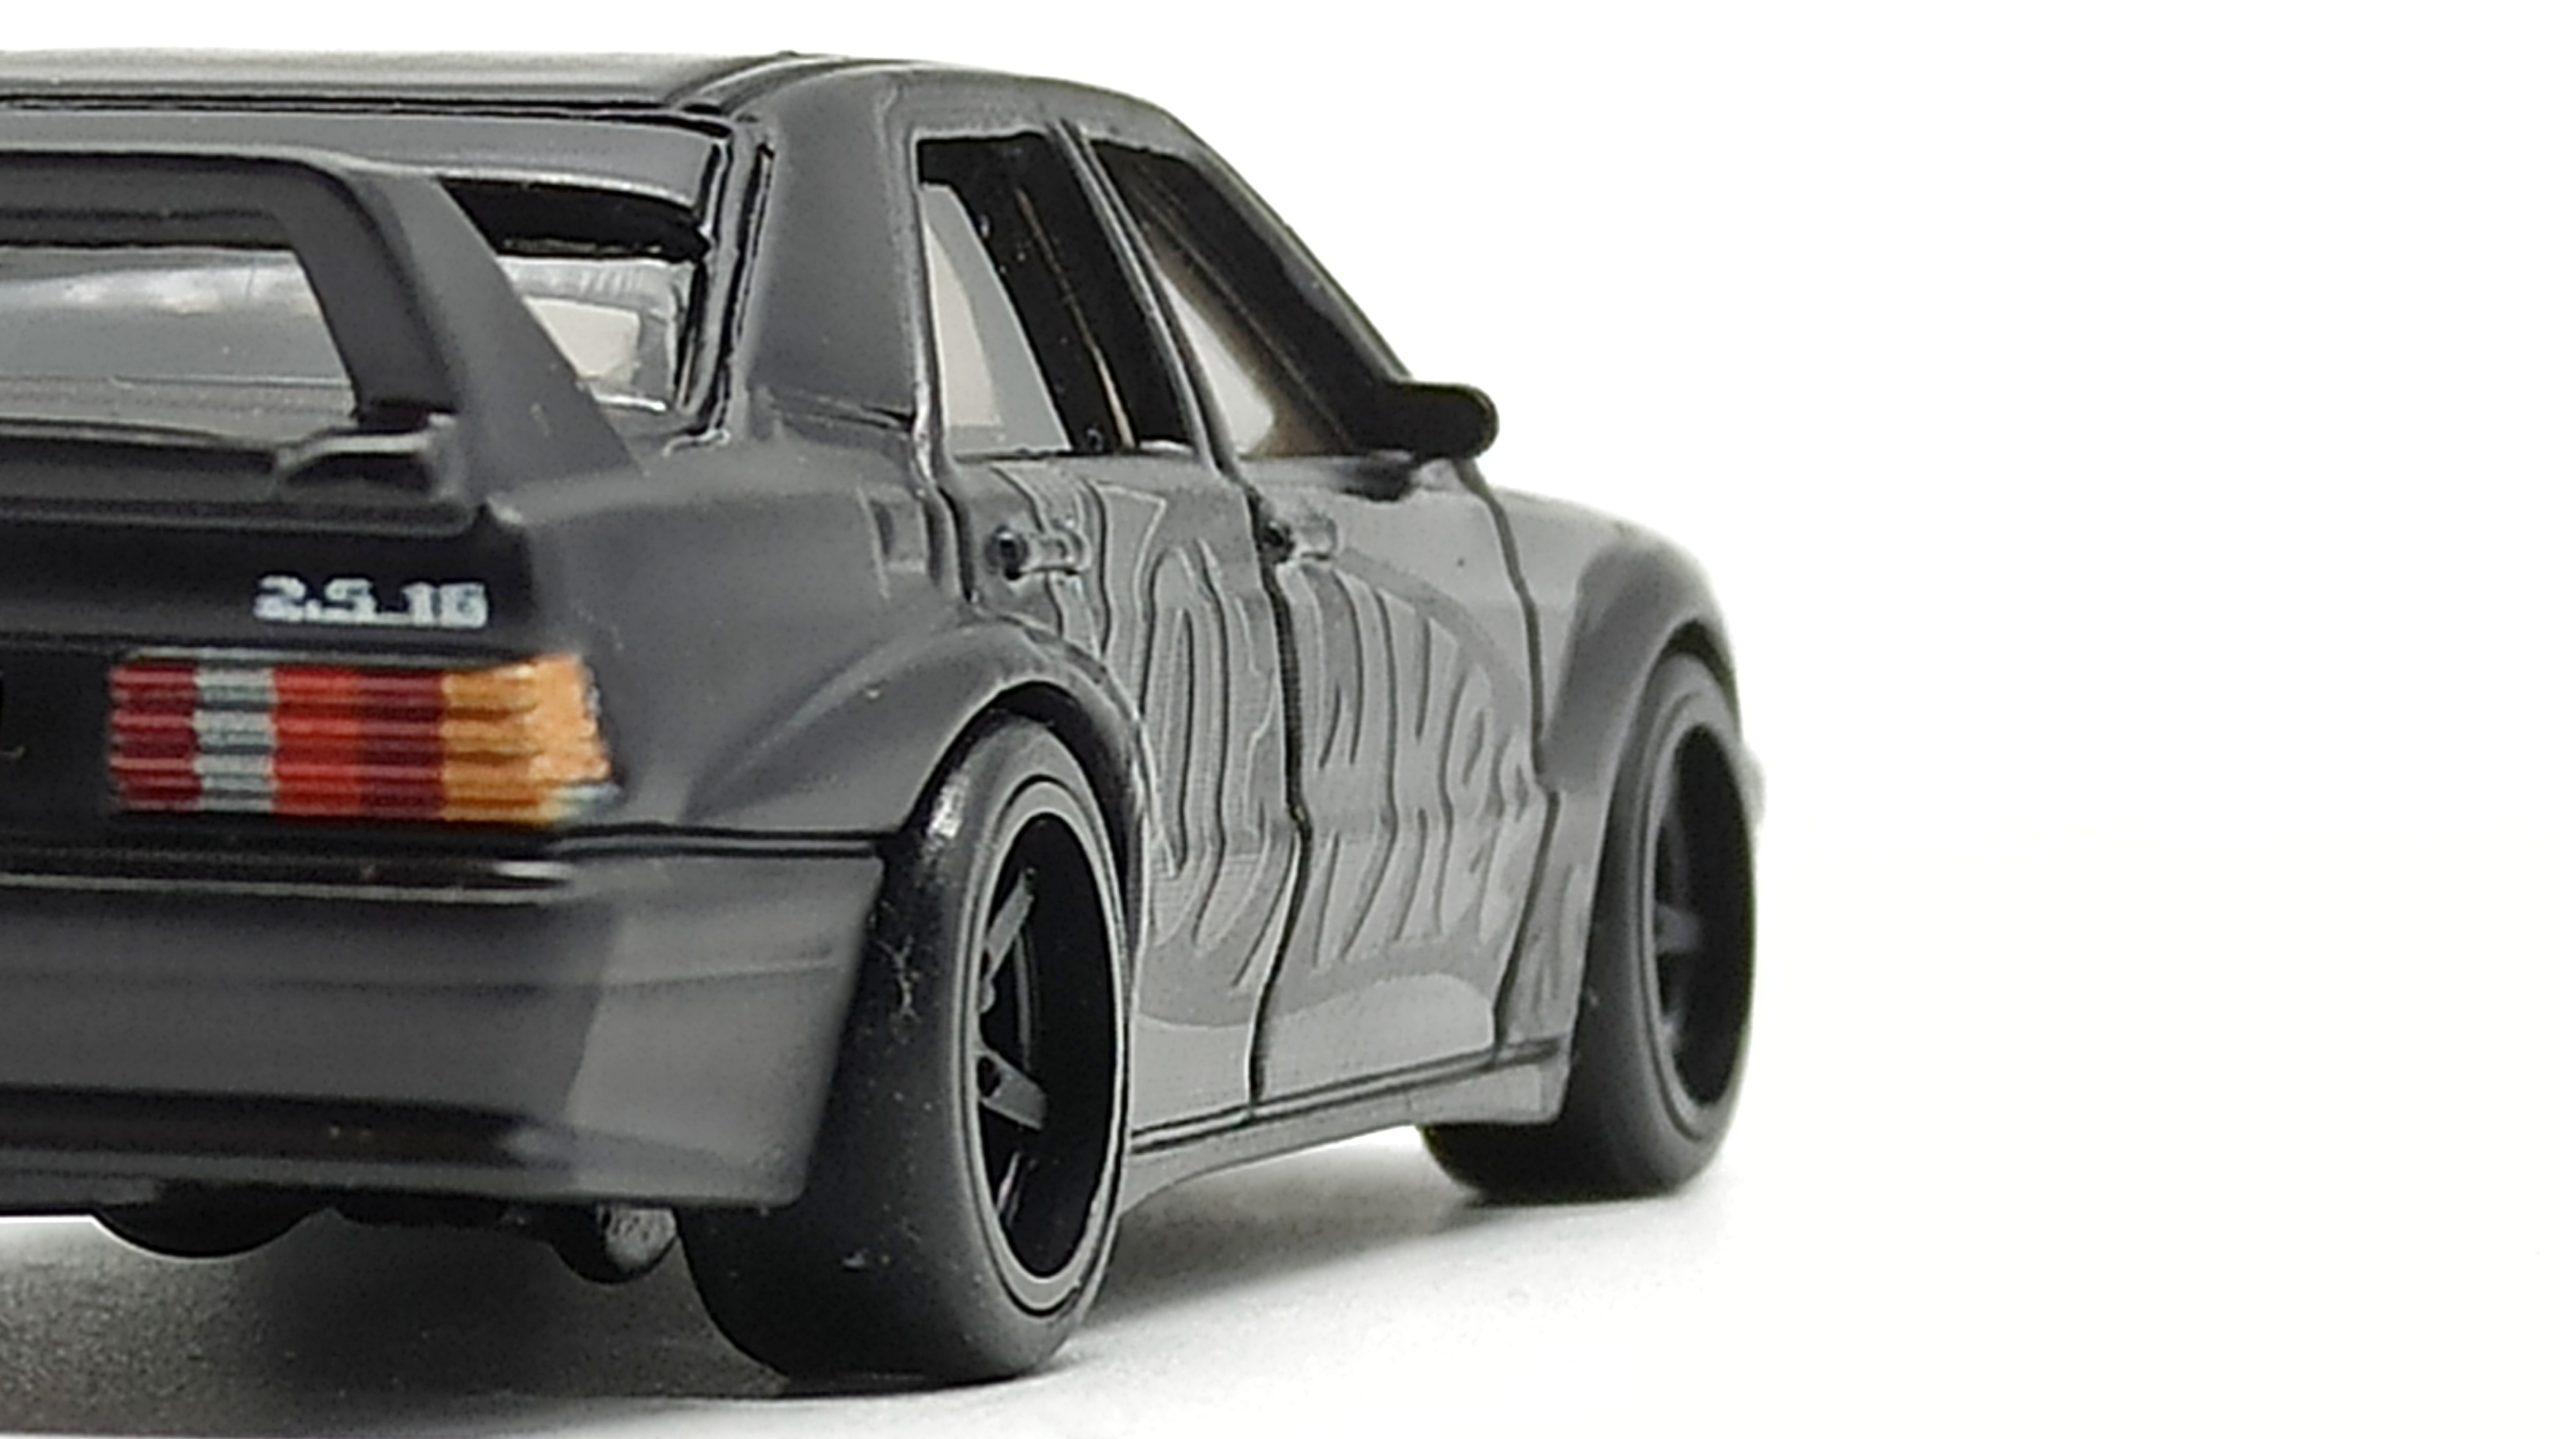 Hot Wheels Mercedes-Benz 190E 2.5-16 EVO II (DWH66) 2021 Display Case Exclusive black back angle